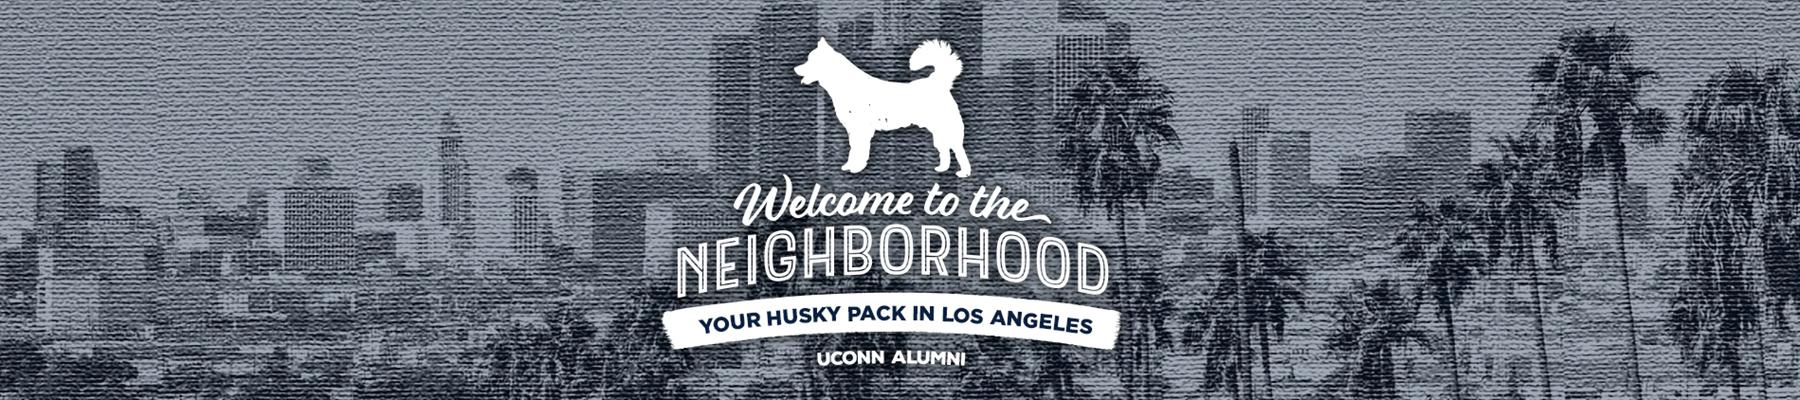 Welcome to the Neighborhood Los Angeles